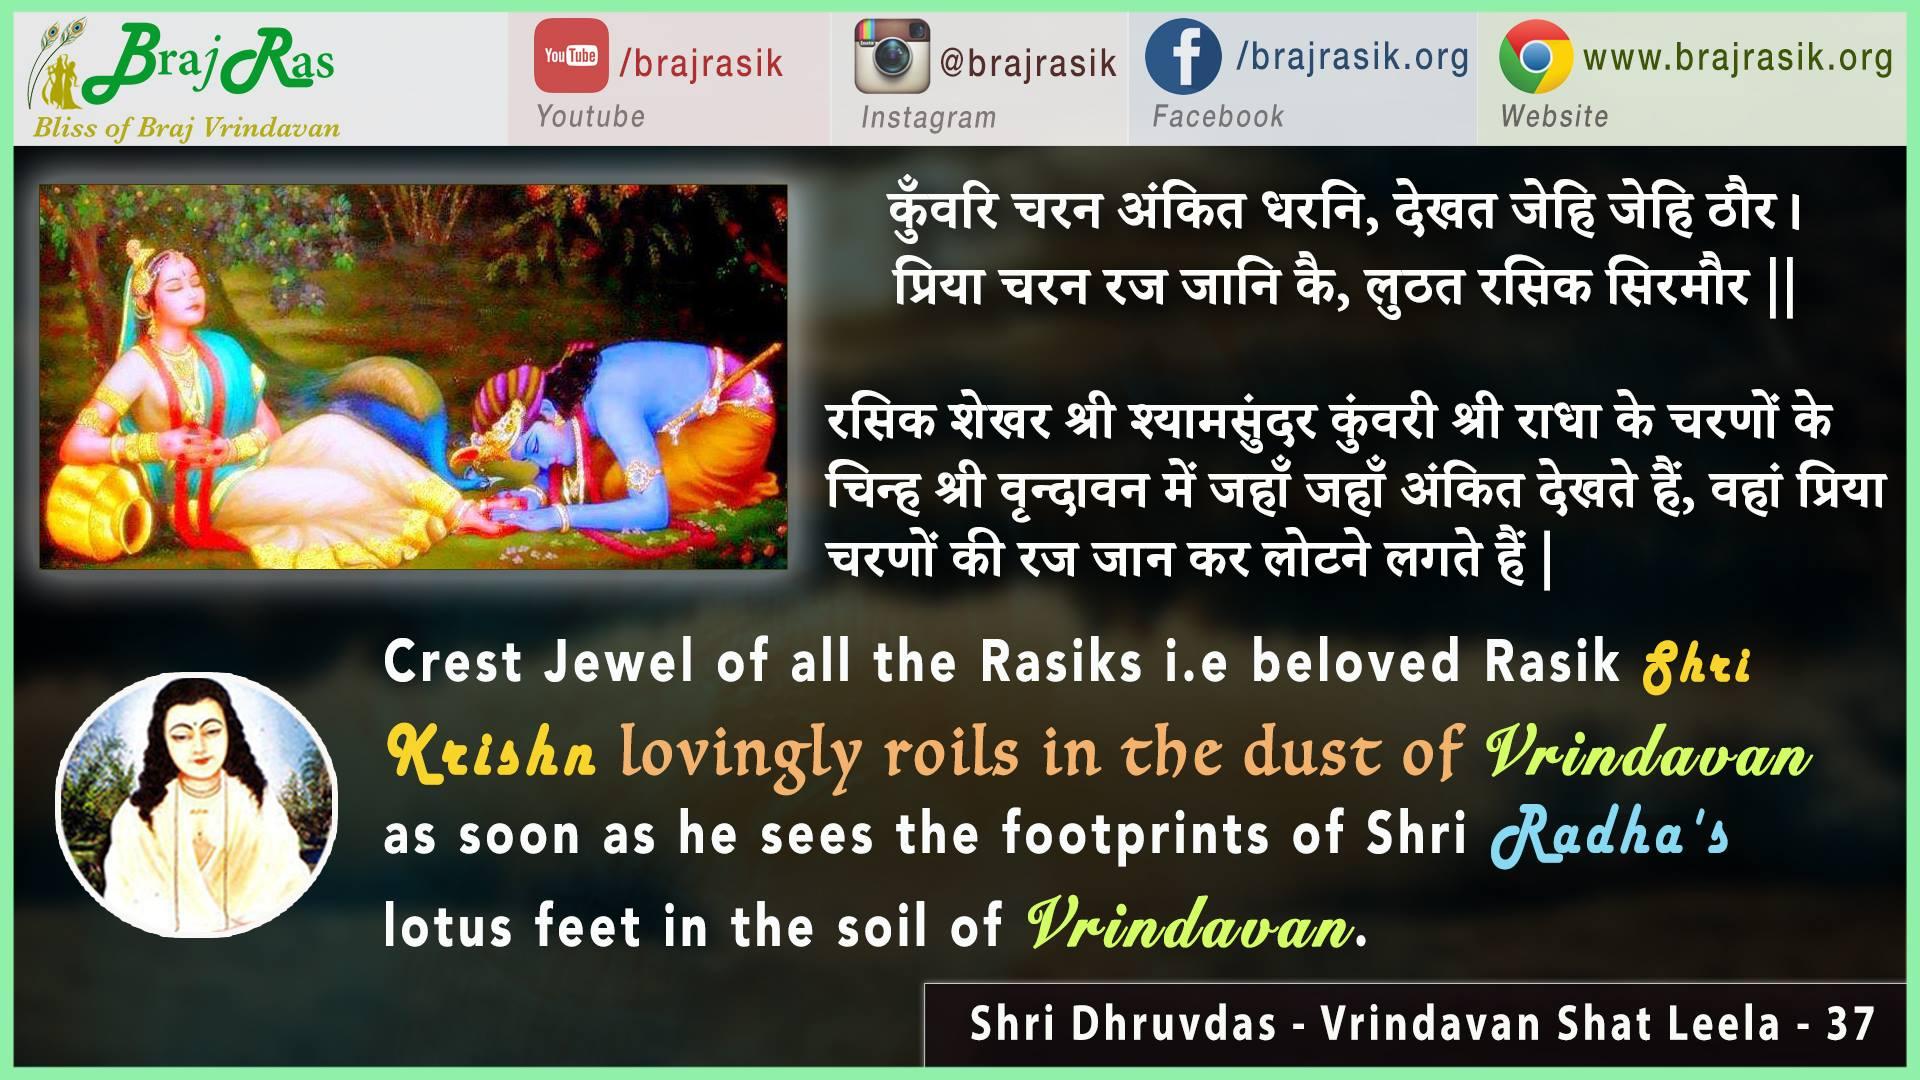 Kunwari Charan Ankit Dharani - Shri Dhruvdas - Vrindavan Shat Leela